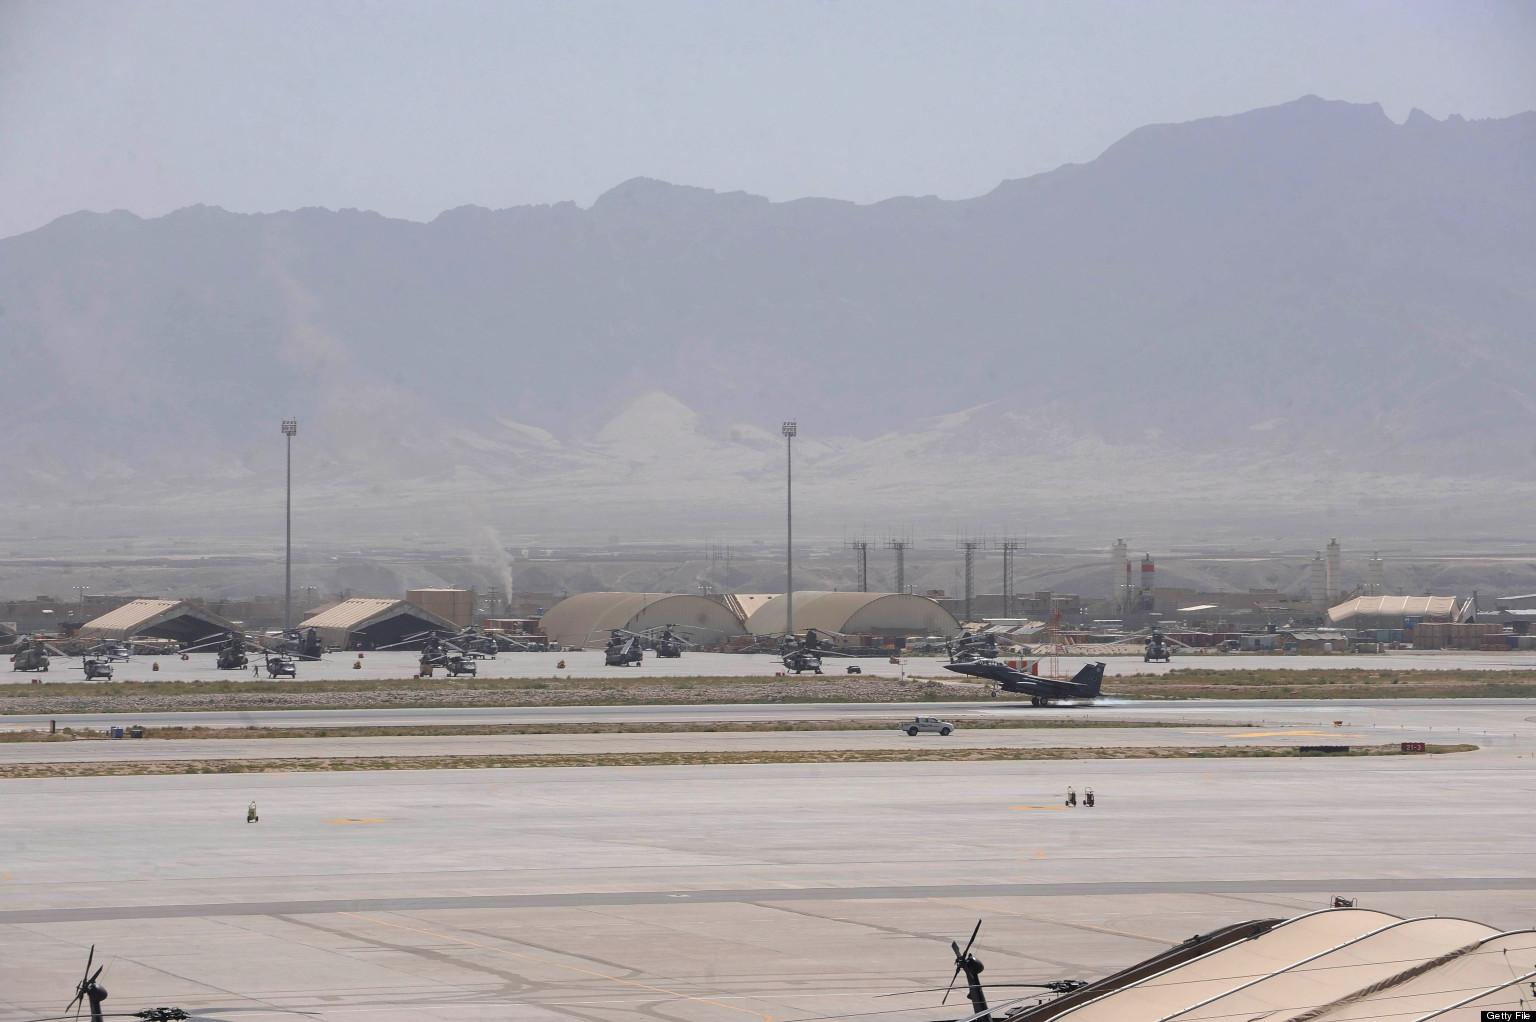 Bagram Air Force Base Bagram Air Force Base Attack